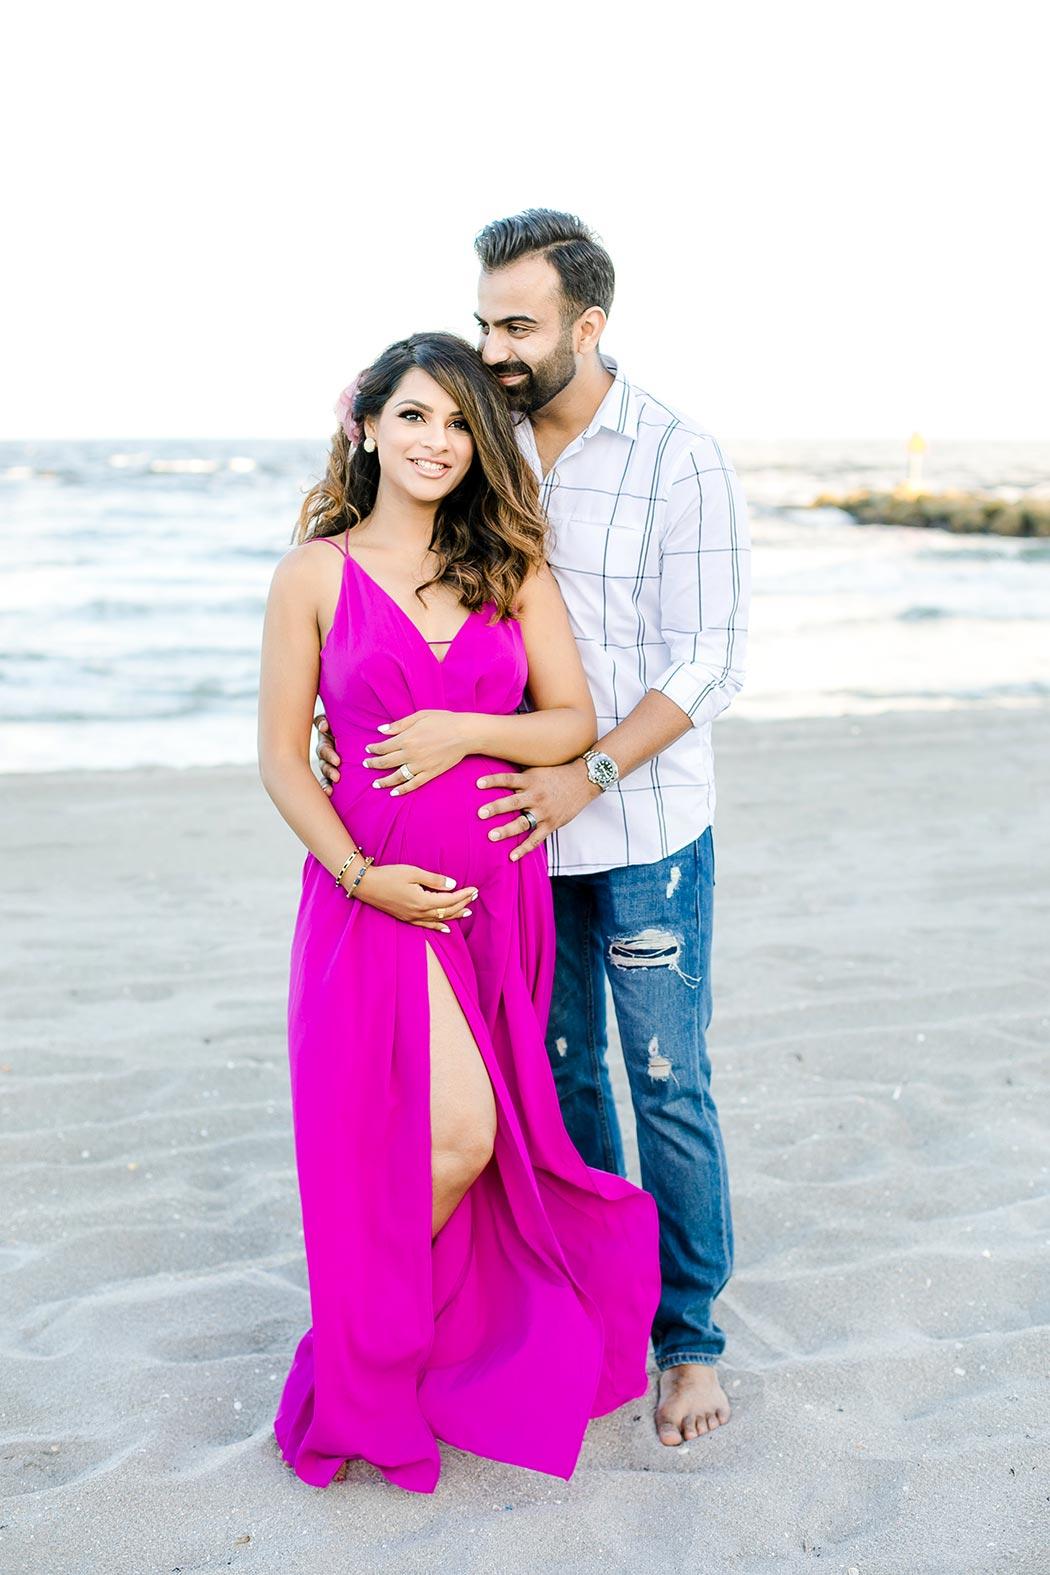 South Florida Beach Maternity Photoshoot